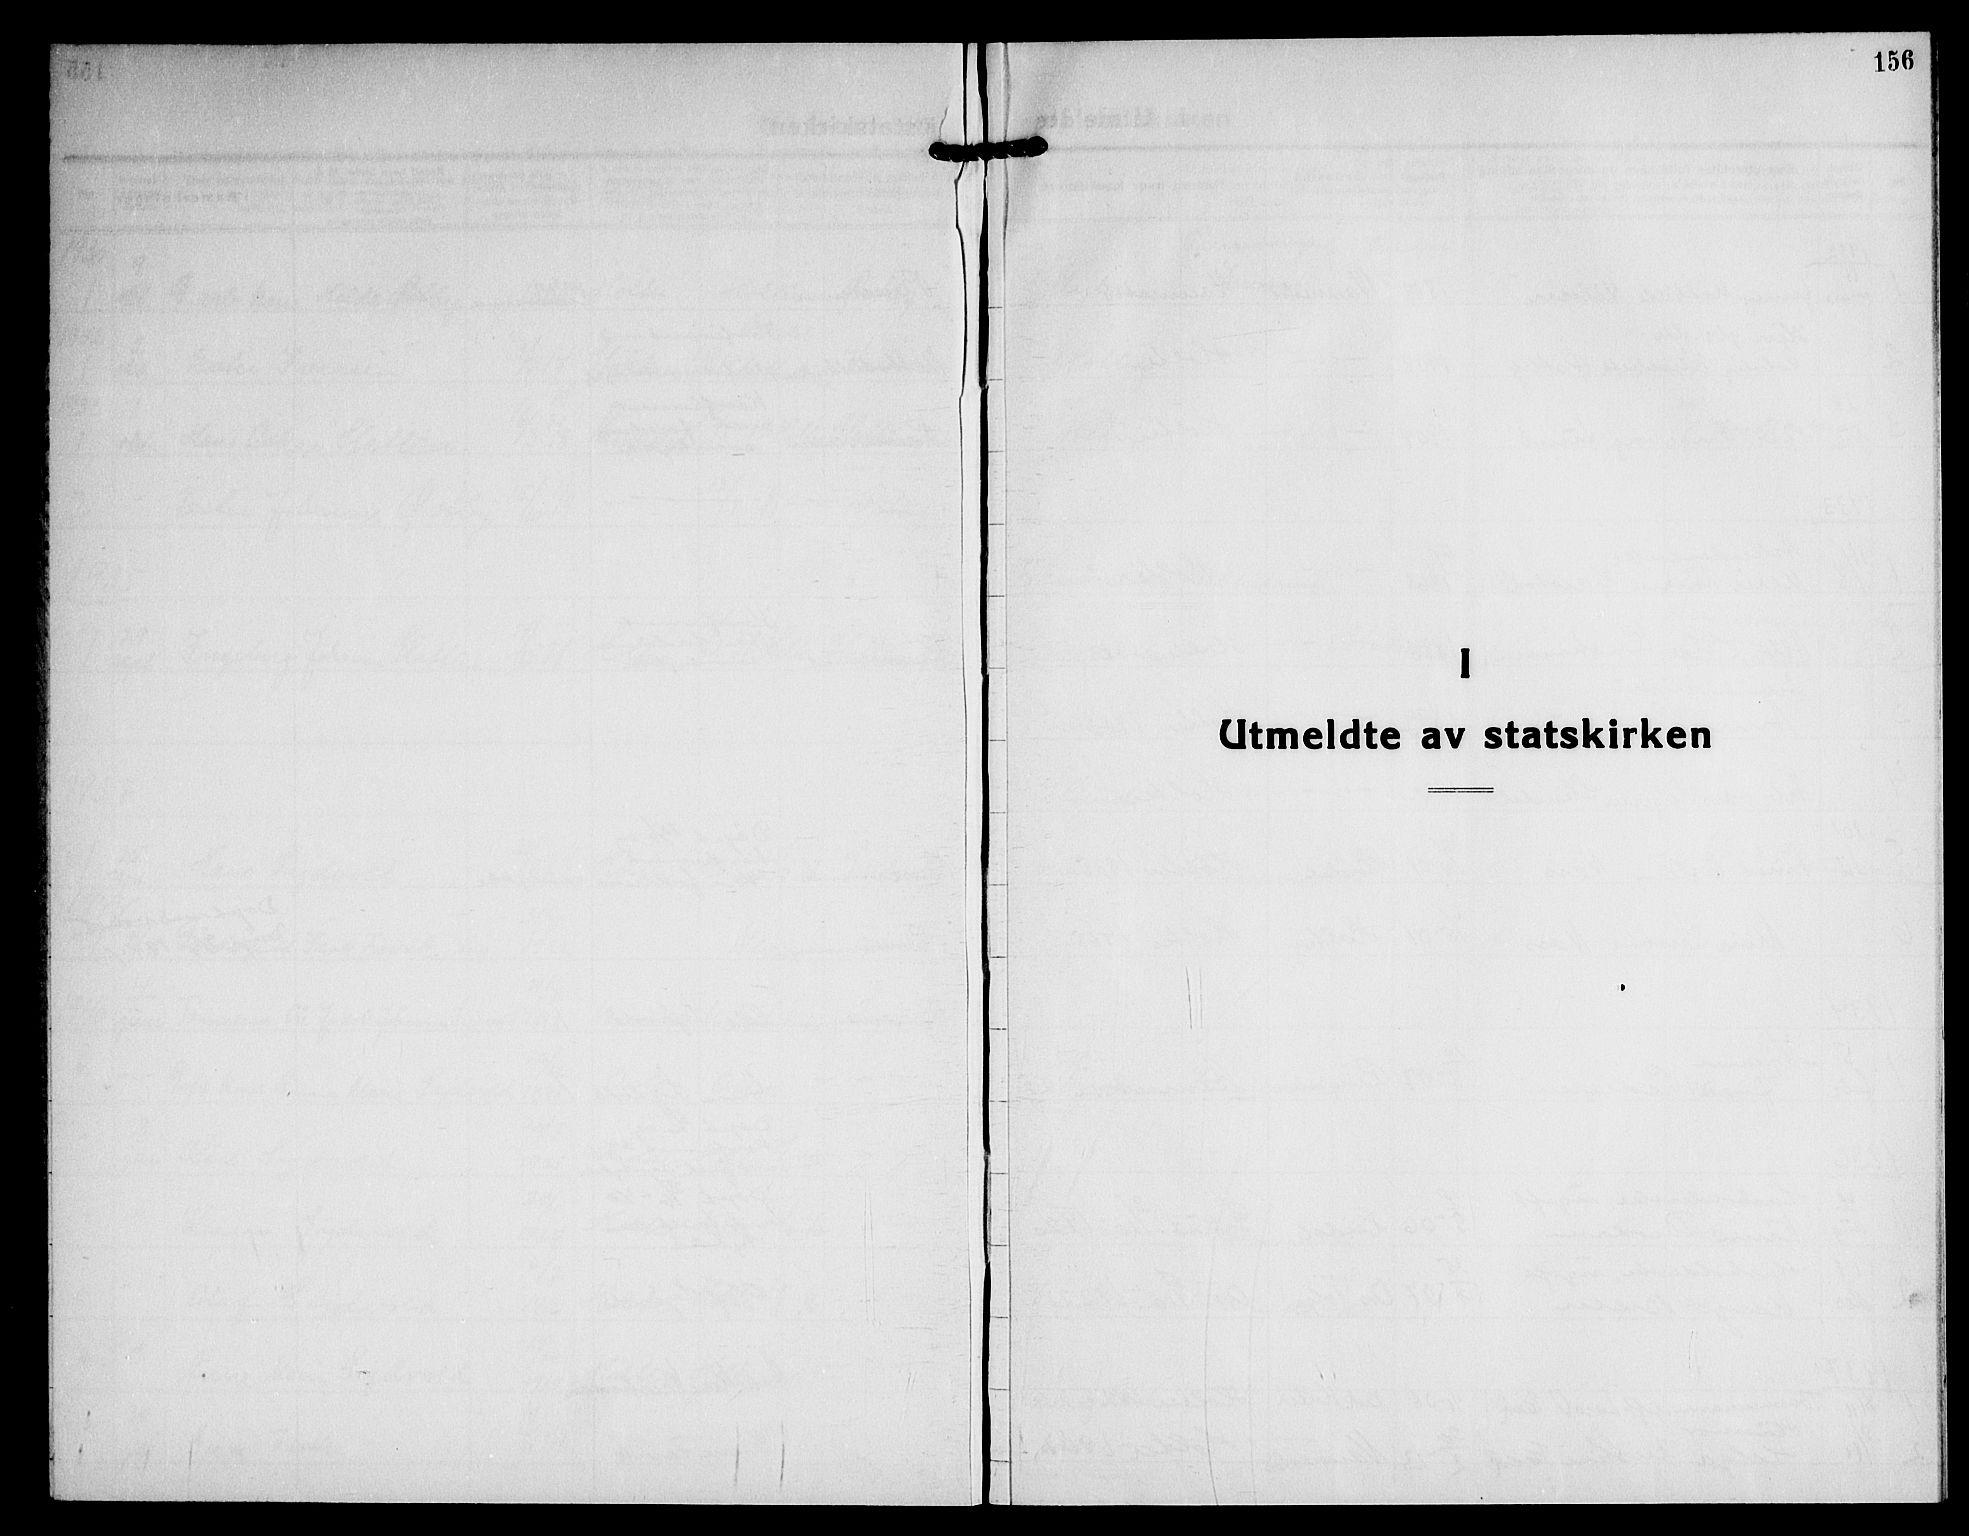 SAO, Nannestad prestekontor Kirkebøker, G/Gb/L0003: Klokkerbok nr. II 3, 1929-1946, s. 156